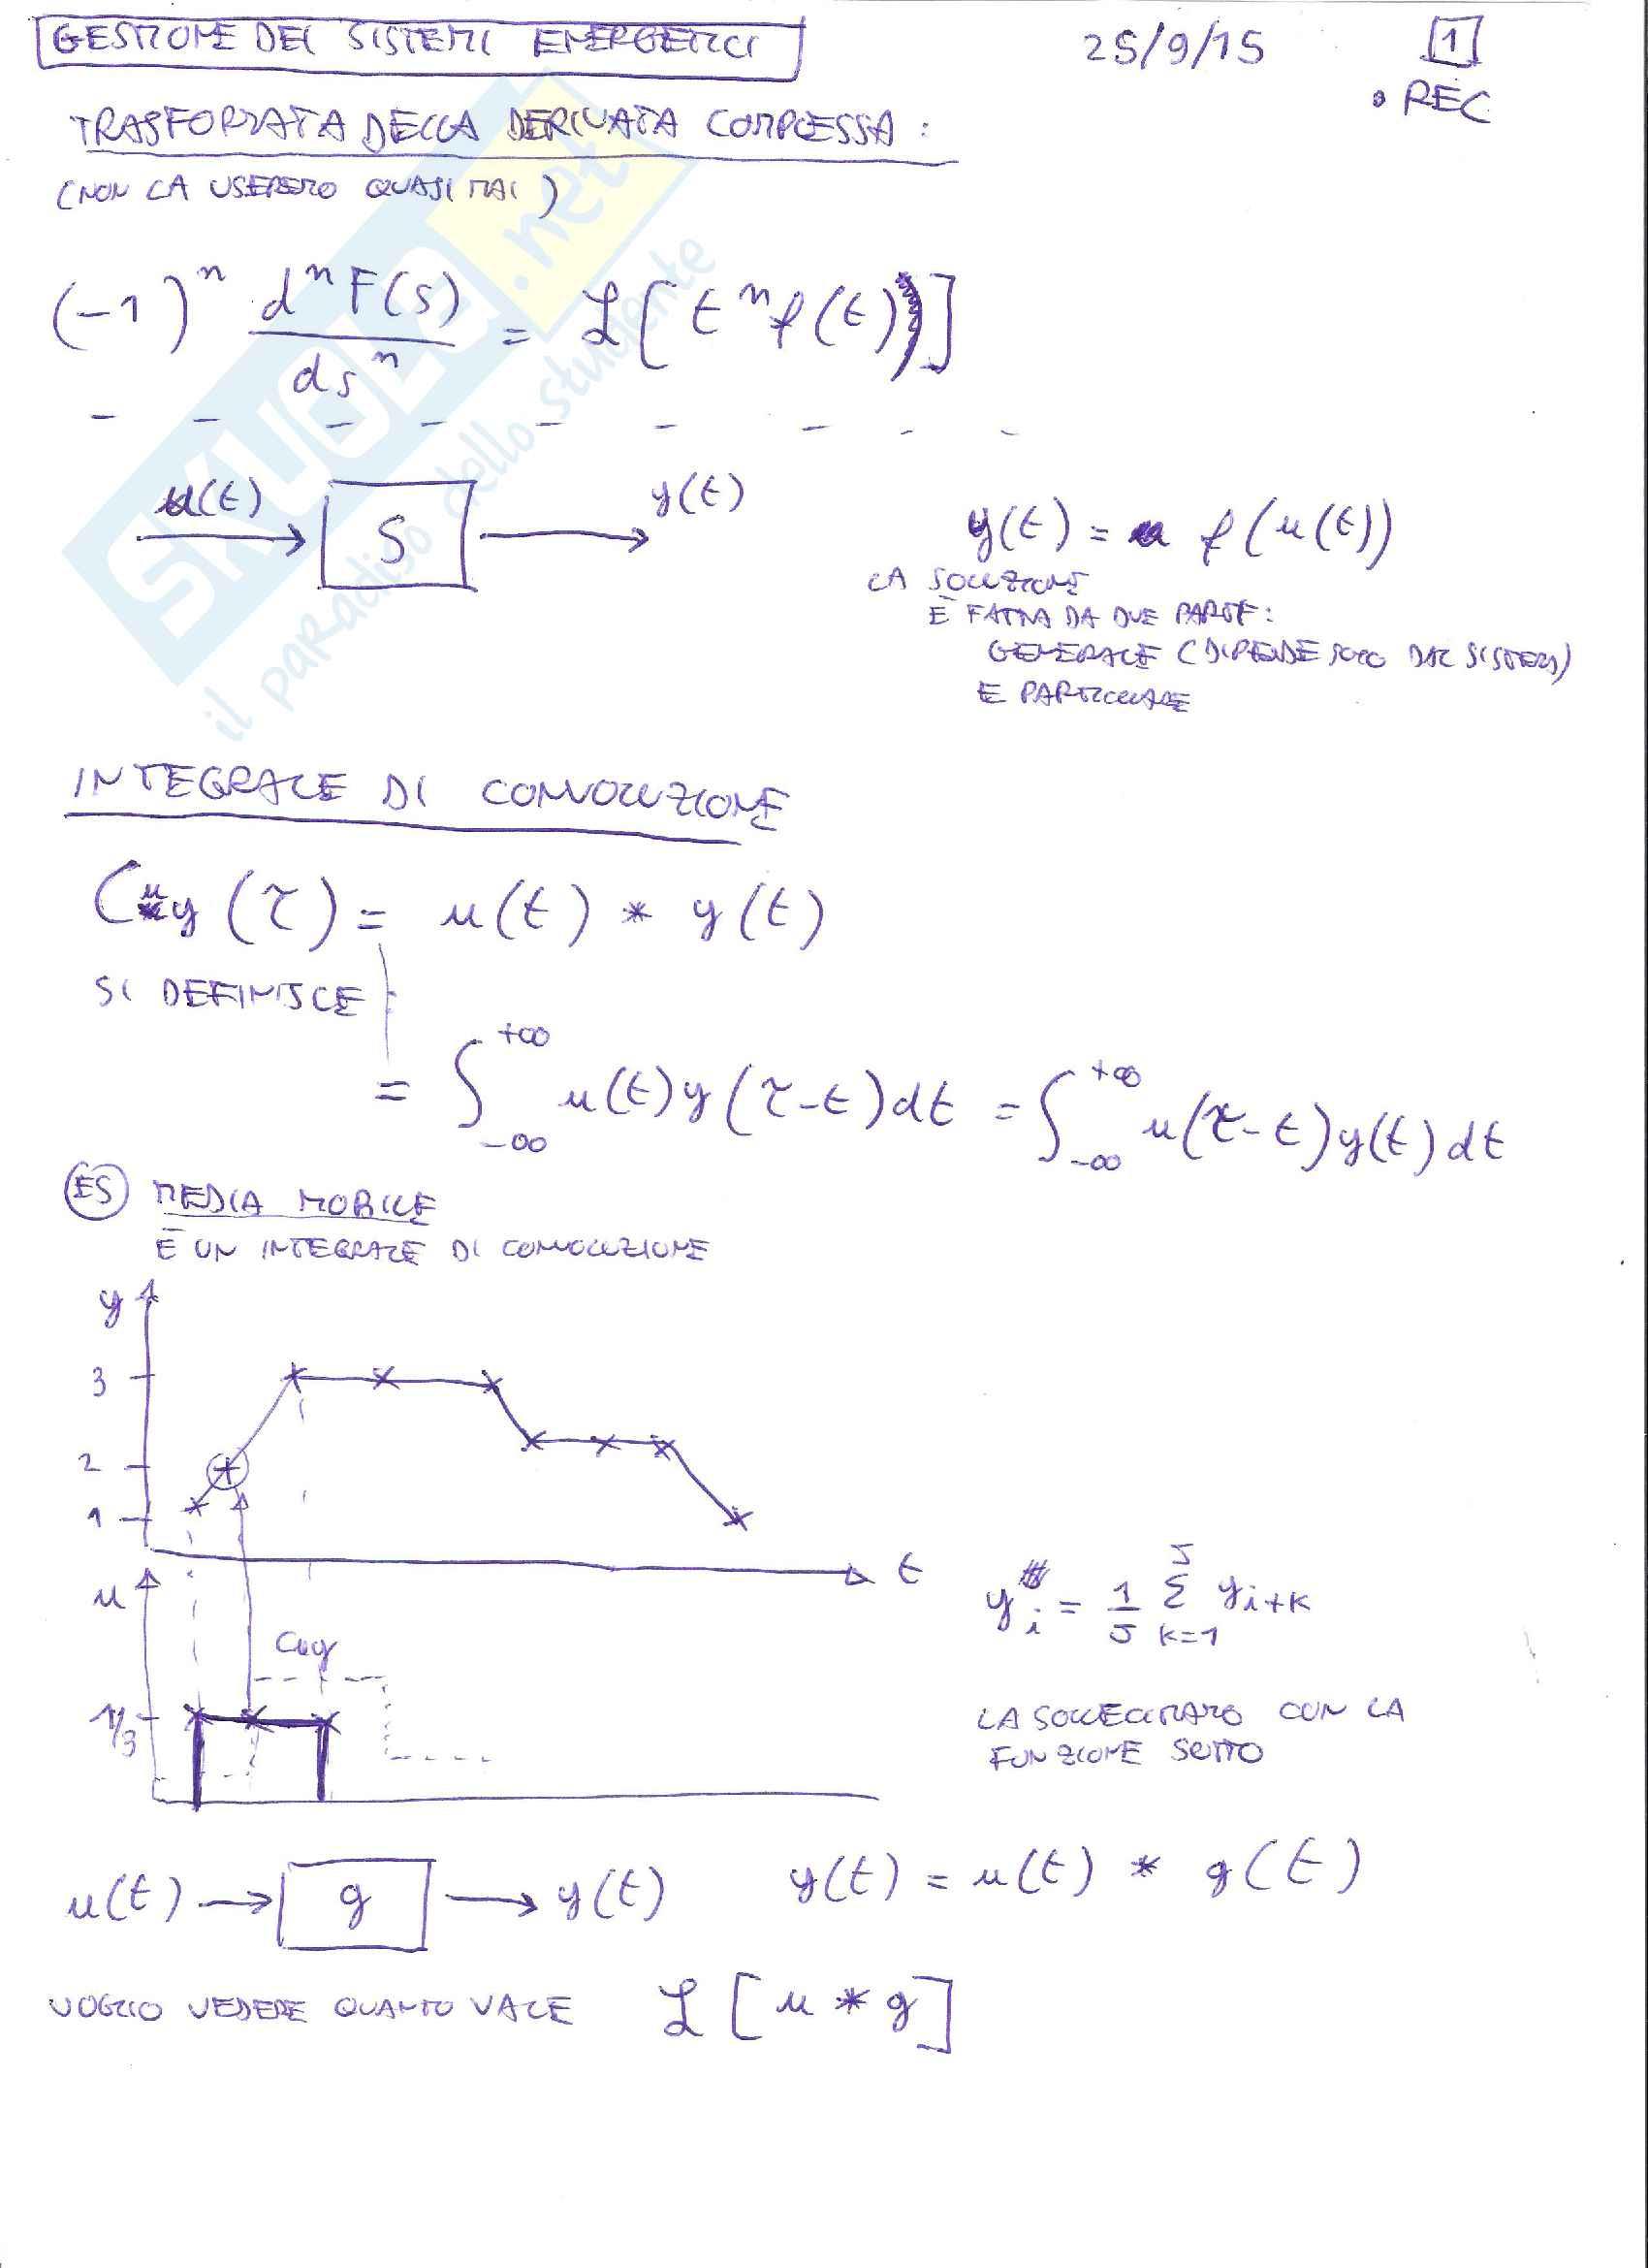 Gestione dei Sistemi Energetici M - Appunti Pag. 11